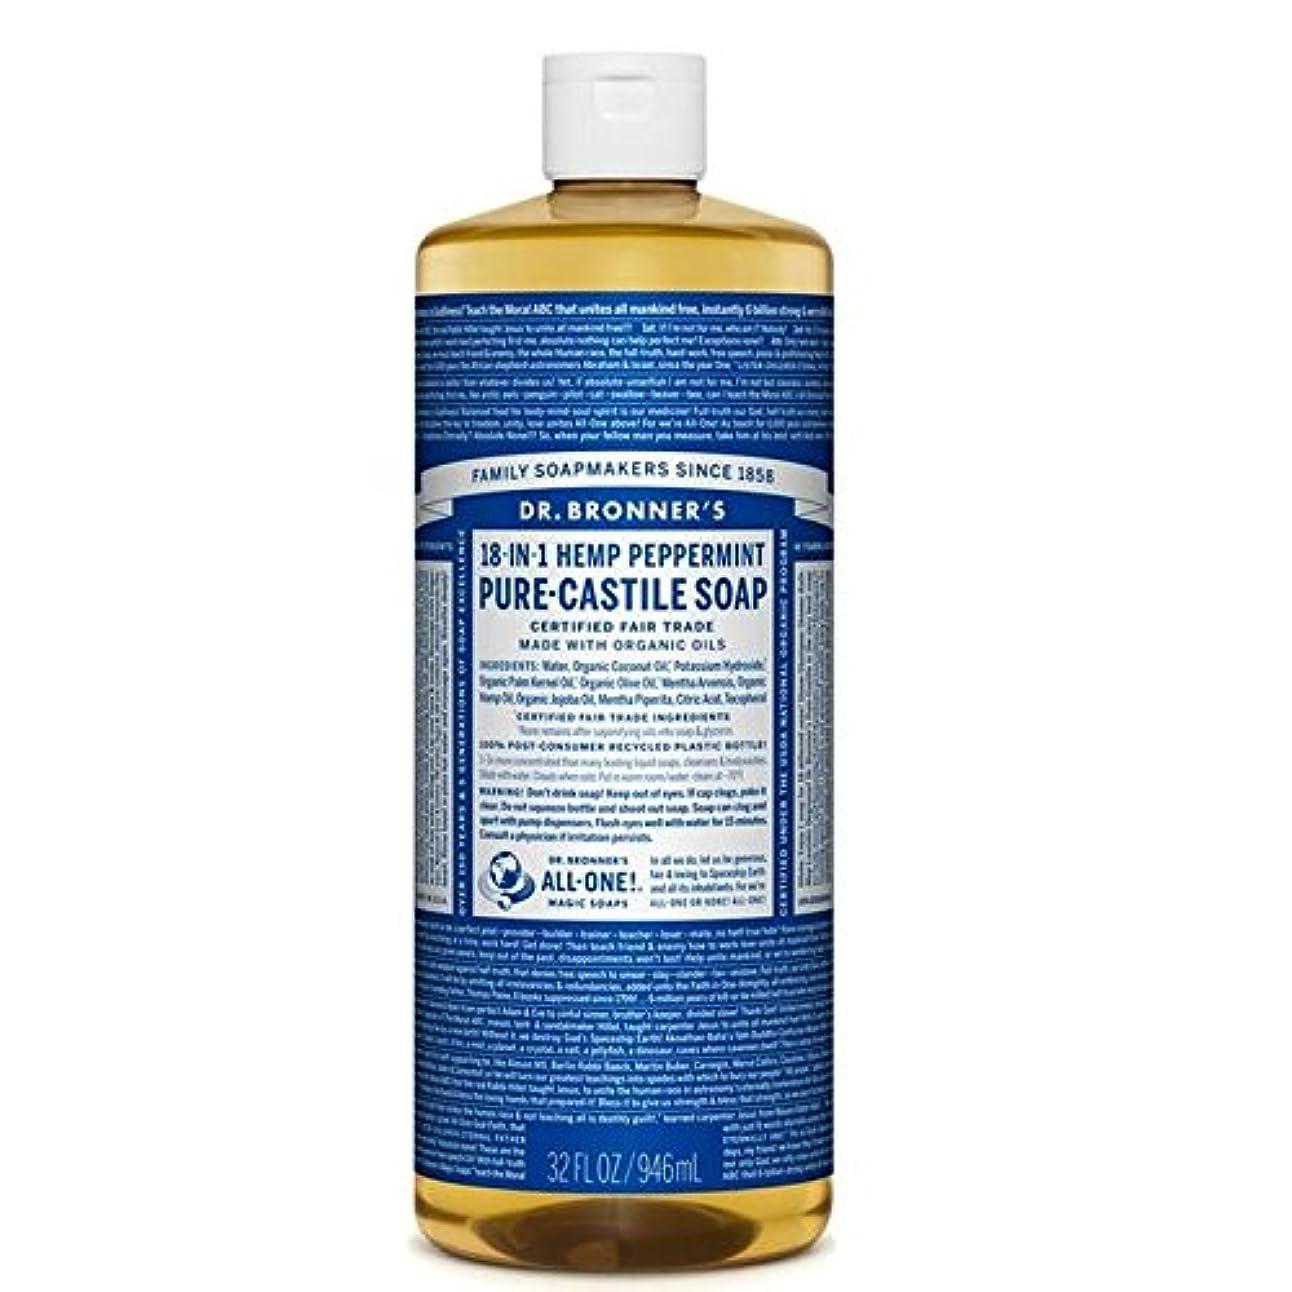 Dr Bronner Organic Peppermint Castile Liquid Soap 946ml - のブロナー有機ペパーミントカスティーリャ液体石鹸946ミリリットル [並行輸入品]